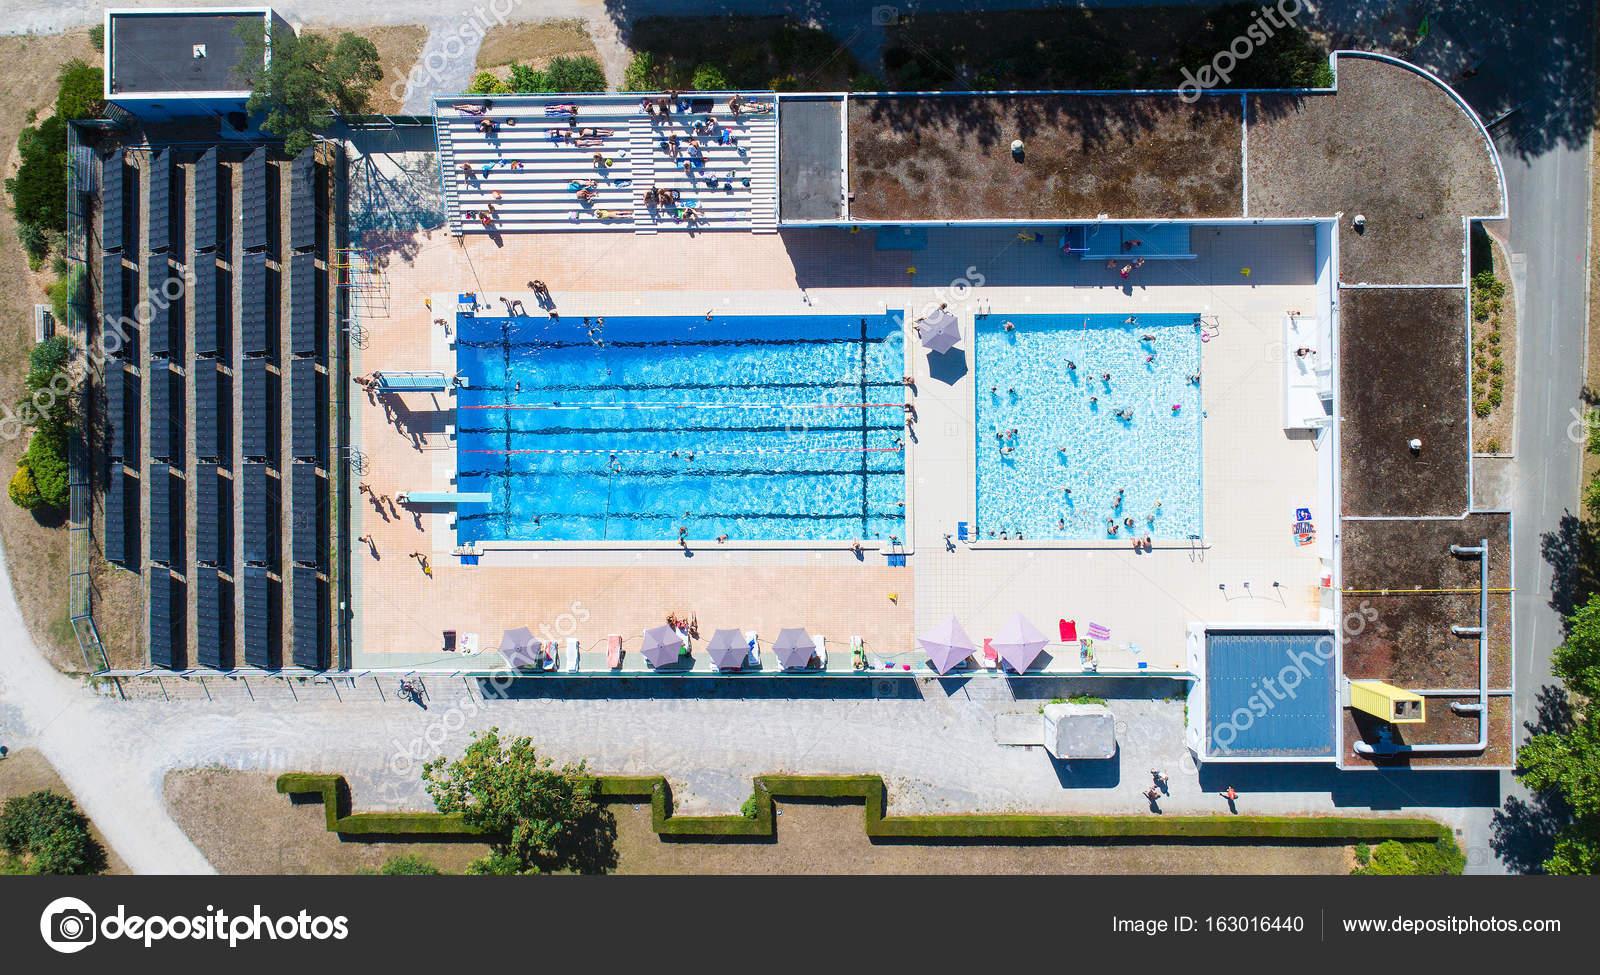 Aerial Photo Of La Charbonniere Public Swimming Pool In ... tout Piscine Ancenis